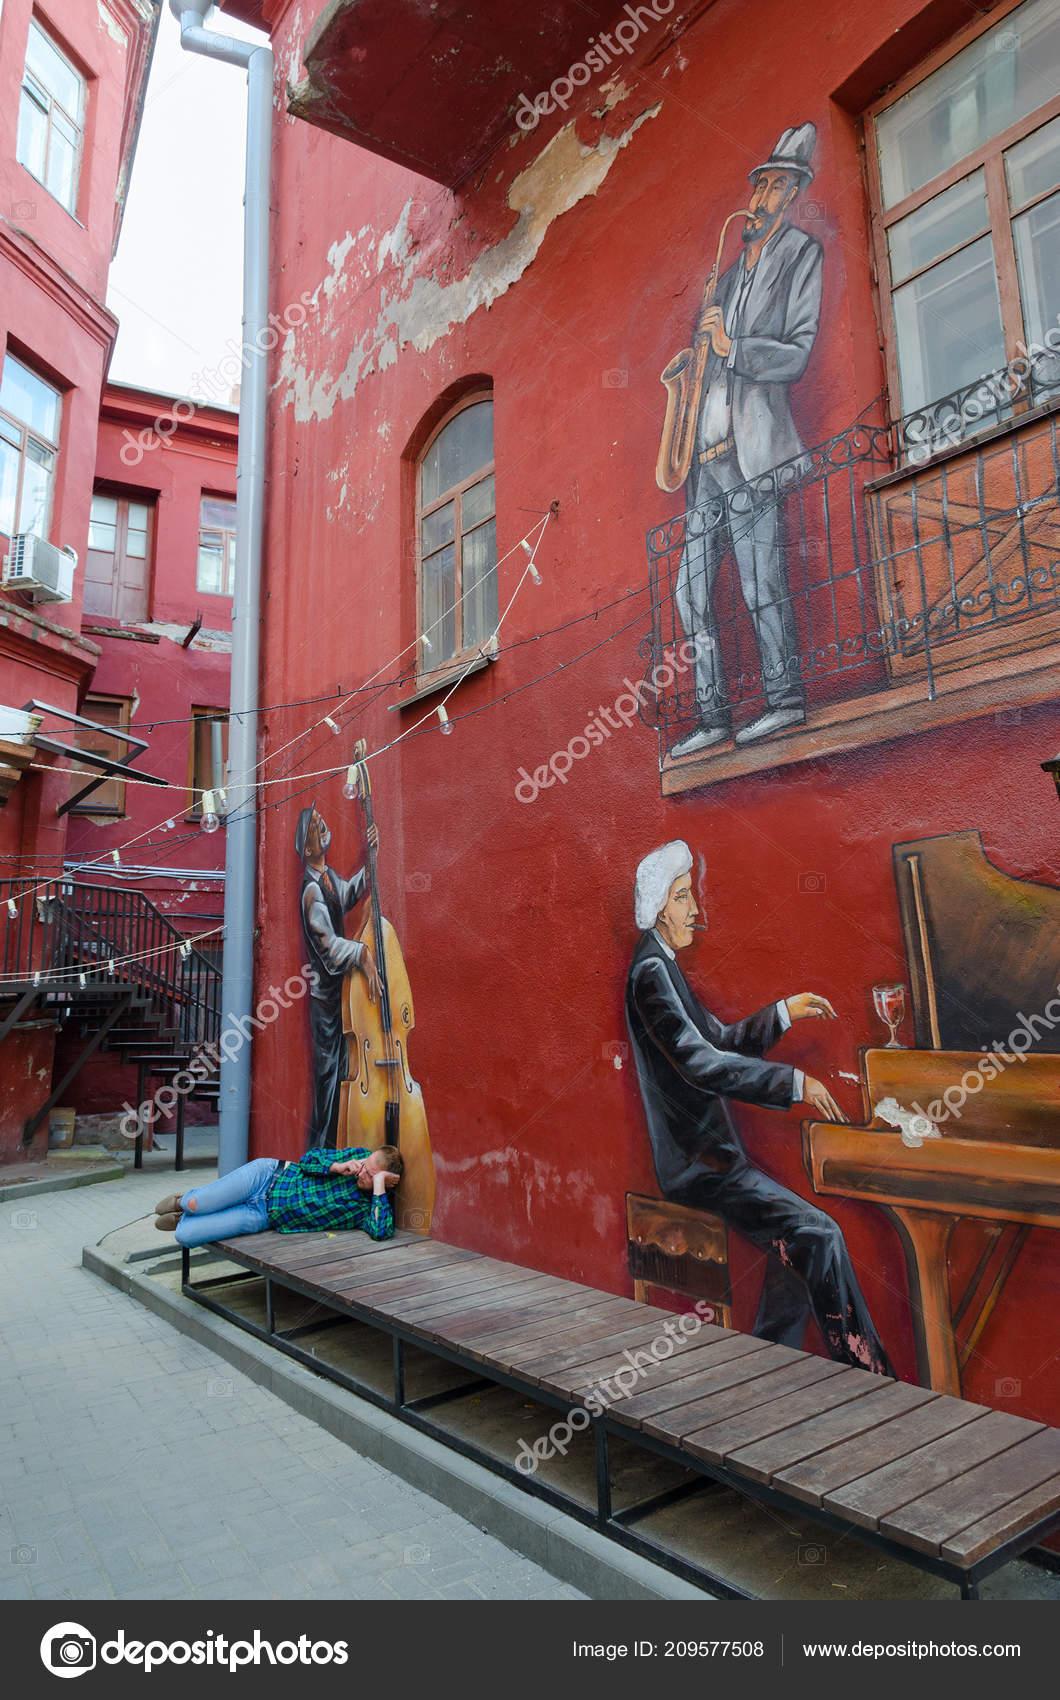 WinterWelVaart | Urban House Groningen | Graffiti Murals | 1700x1060